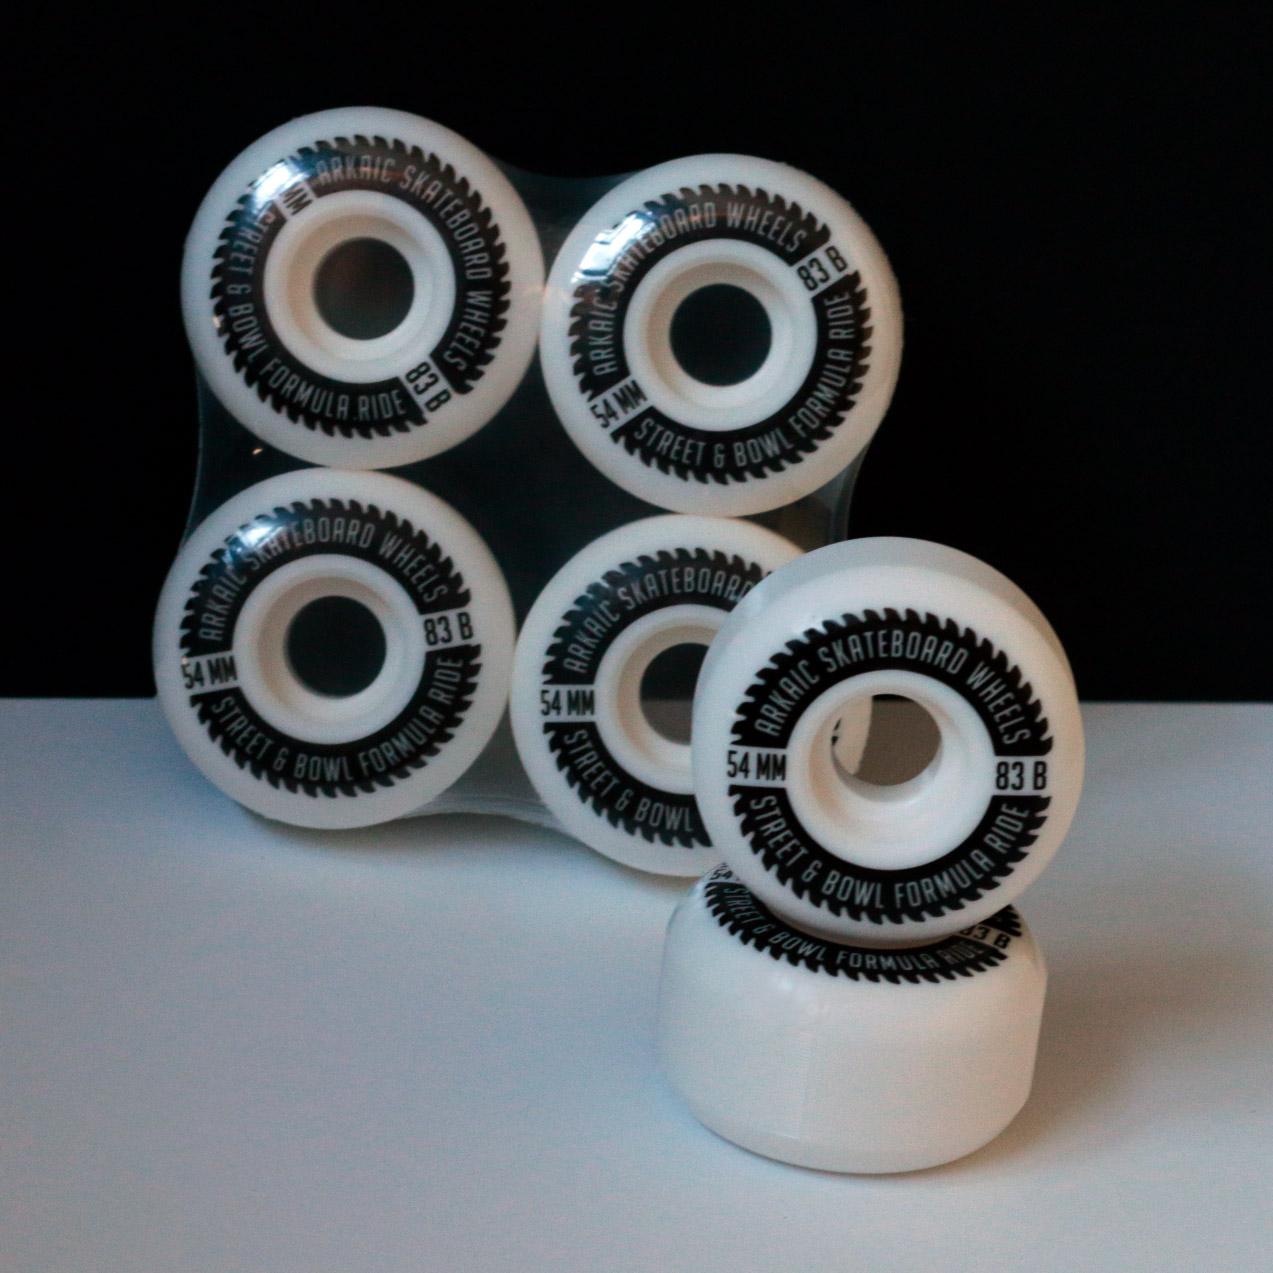 Arkaic skateboard 54mm lyon caluire roue street skateboard arkaic concept made in france eco friendly caluire et cuire